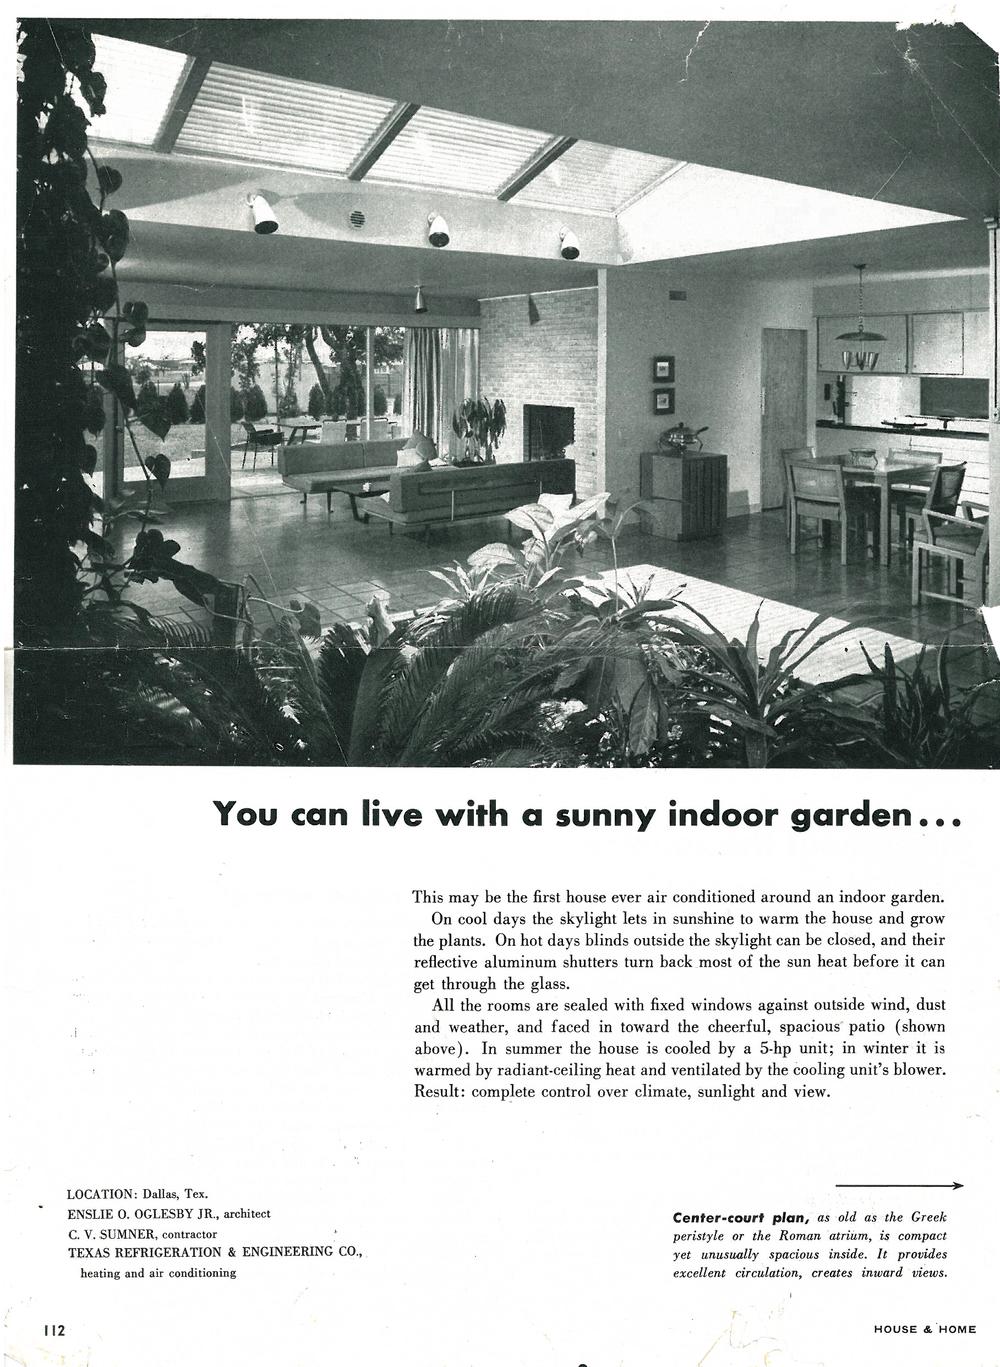 House & Home 1954